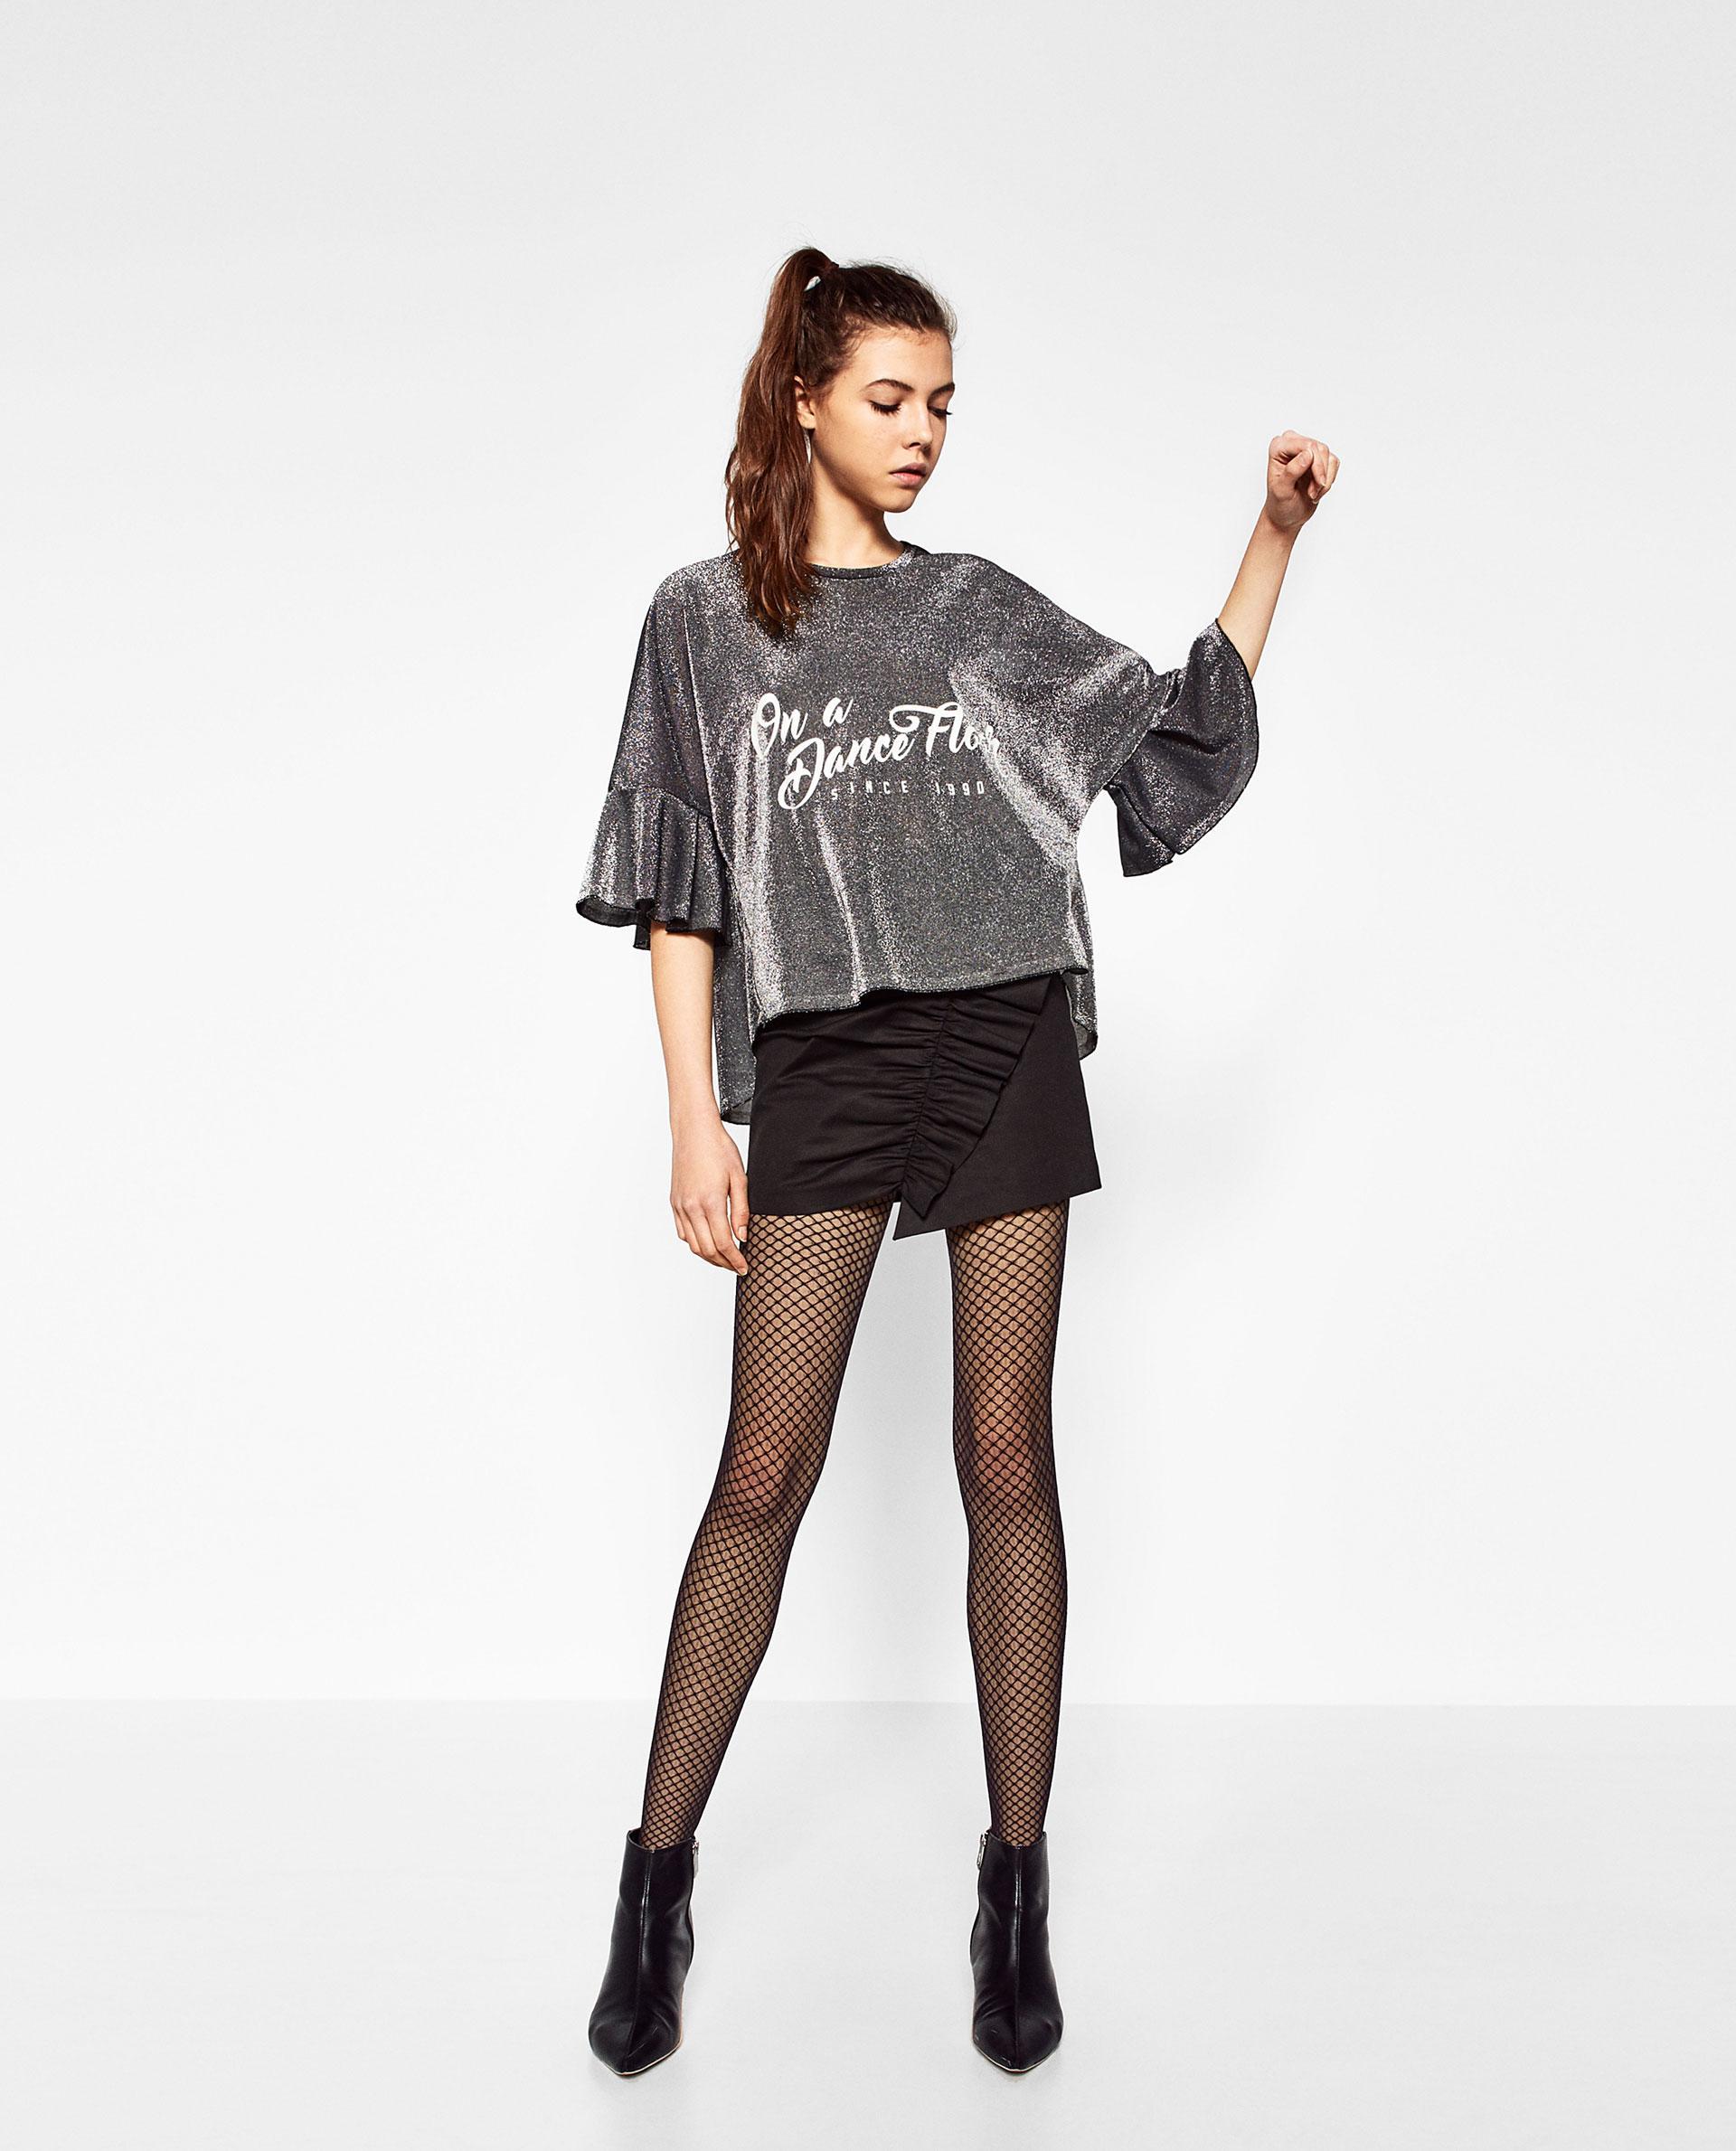 Zara frilled shiny t shirt in black lyst for Zara black t shirt dress